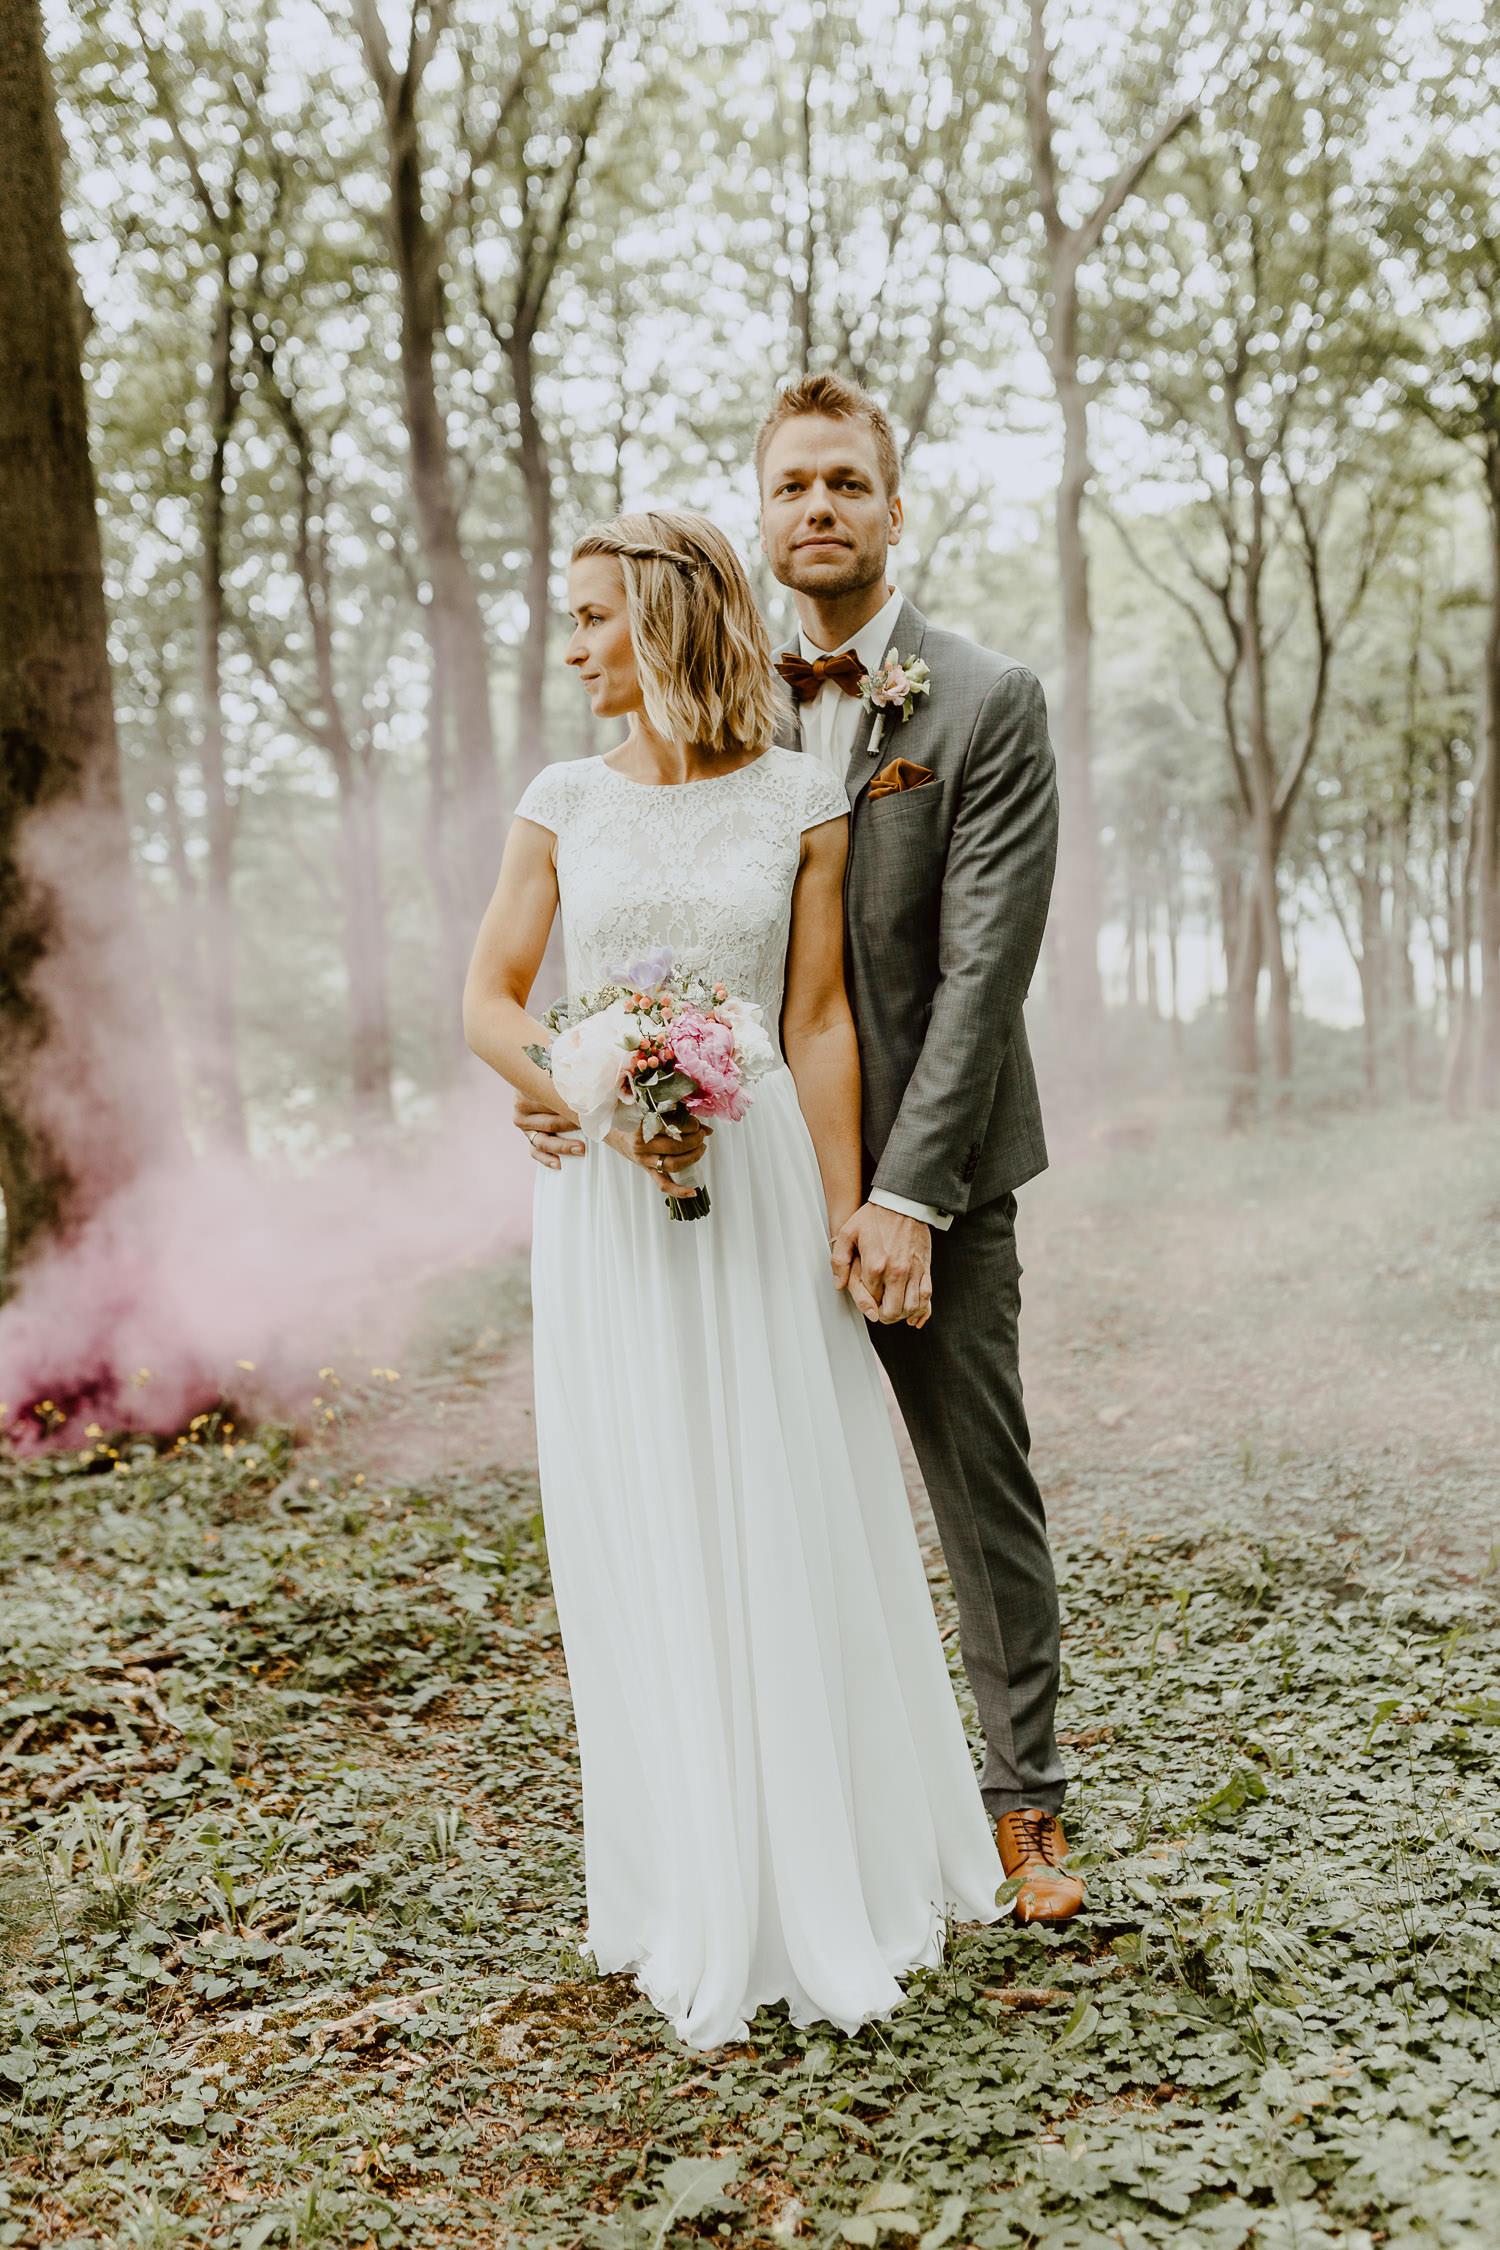 Brautpaarshooting mit Rauchbombe